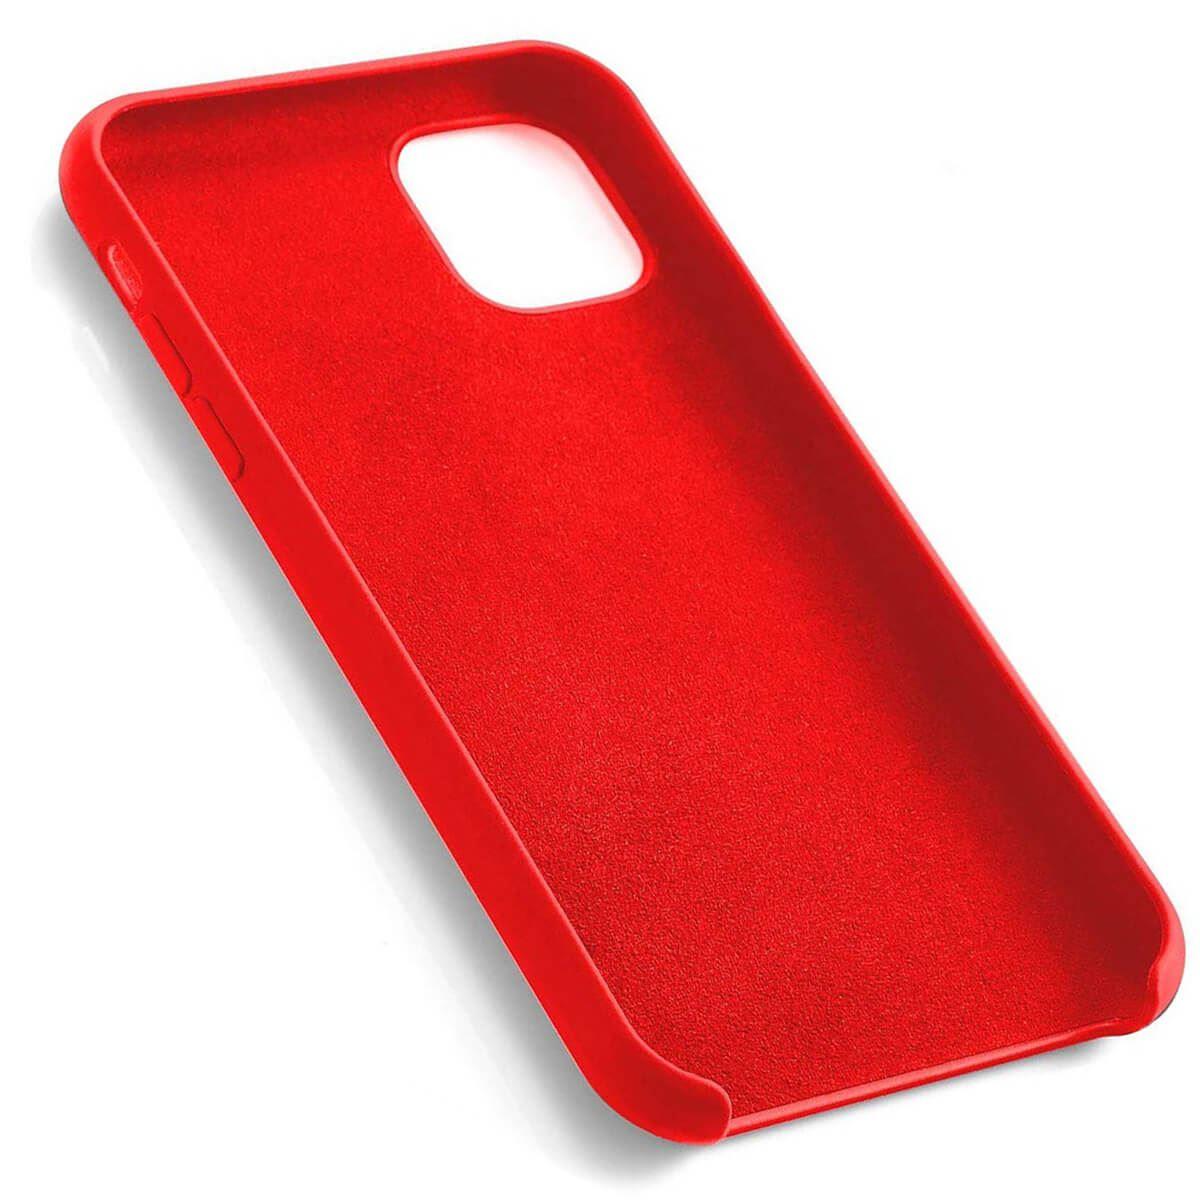 Leather-Slim-Case-Apple-iPhone-10-8-7-Plus-6s-5-Original-PU-Soft-Silicone-Cover thumbnail 24